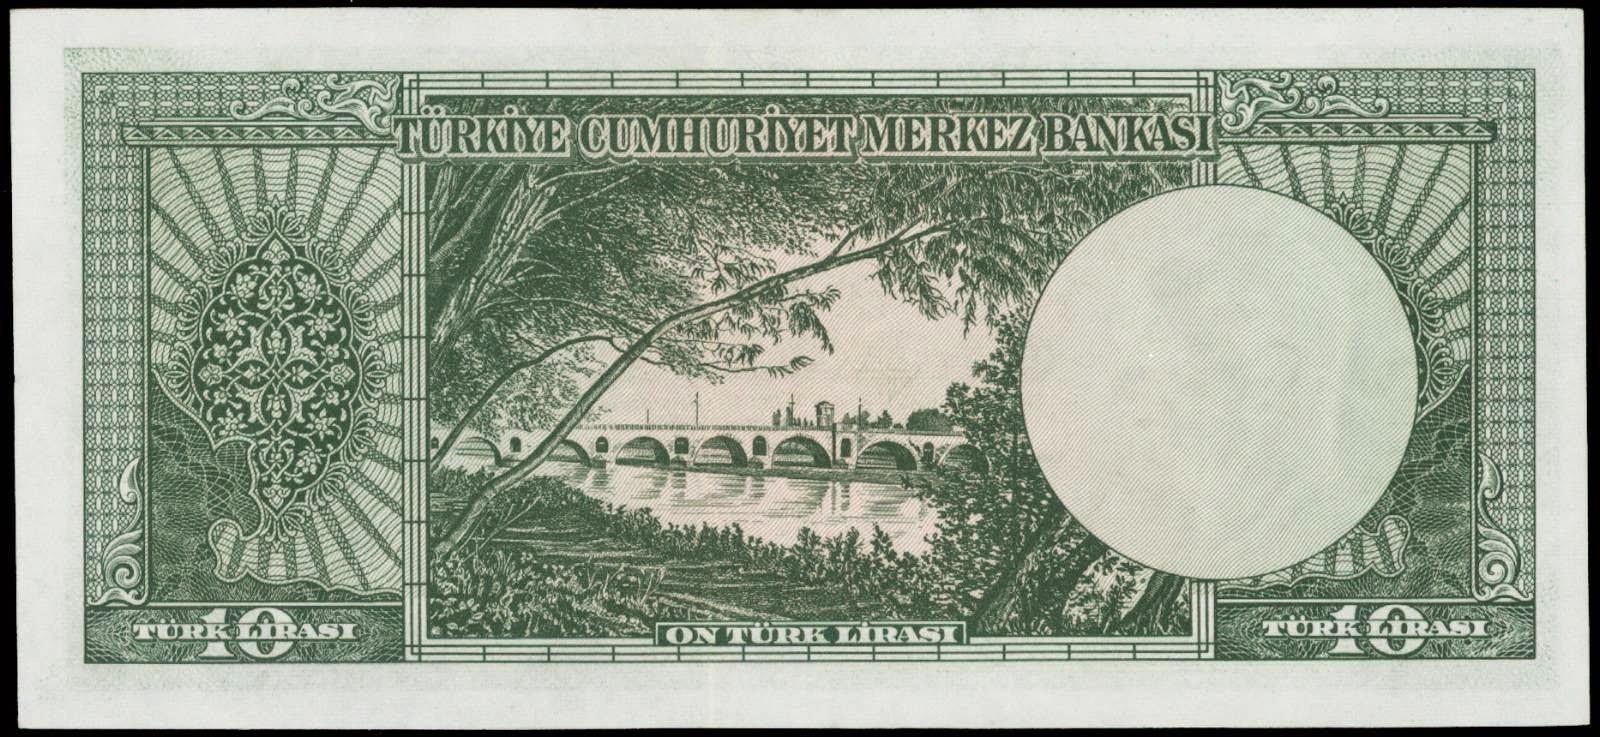 10 Turkish Lira note 1960